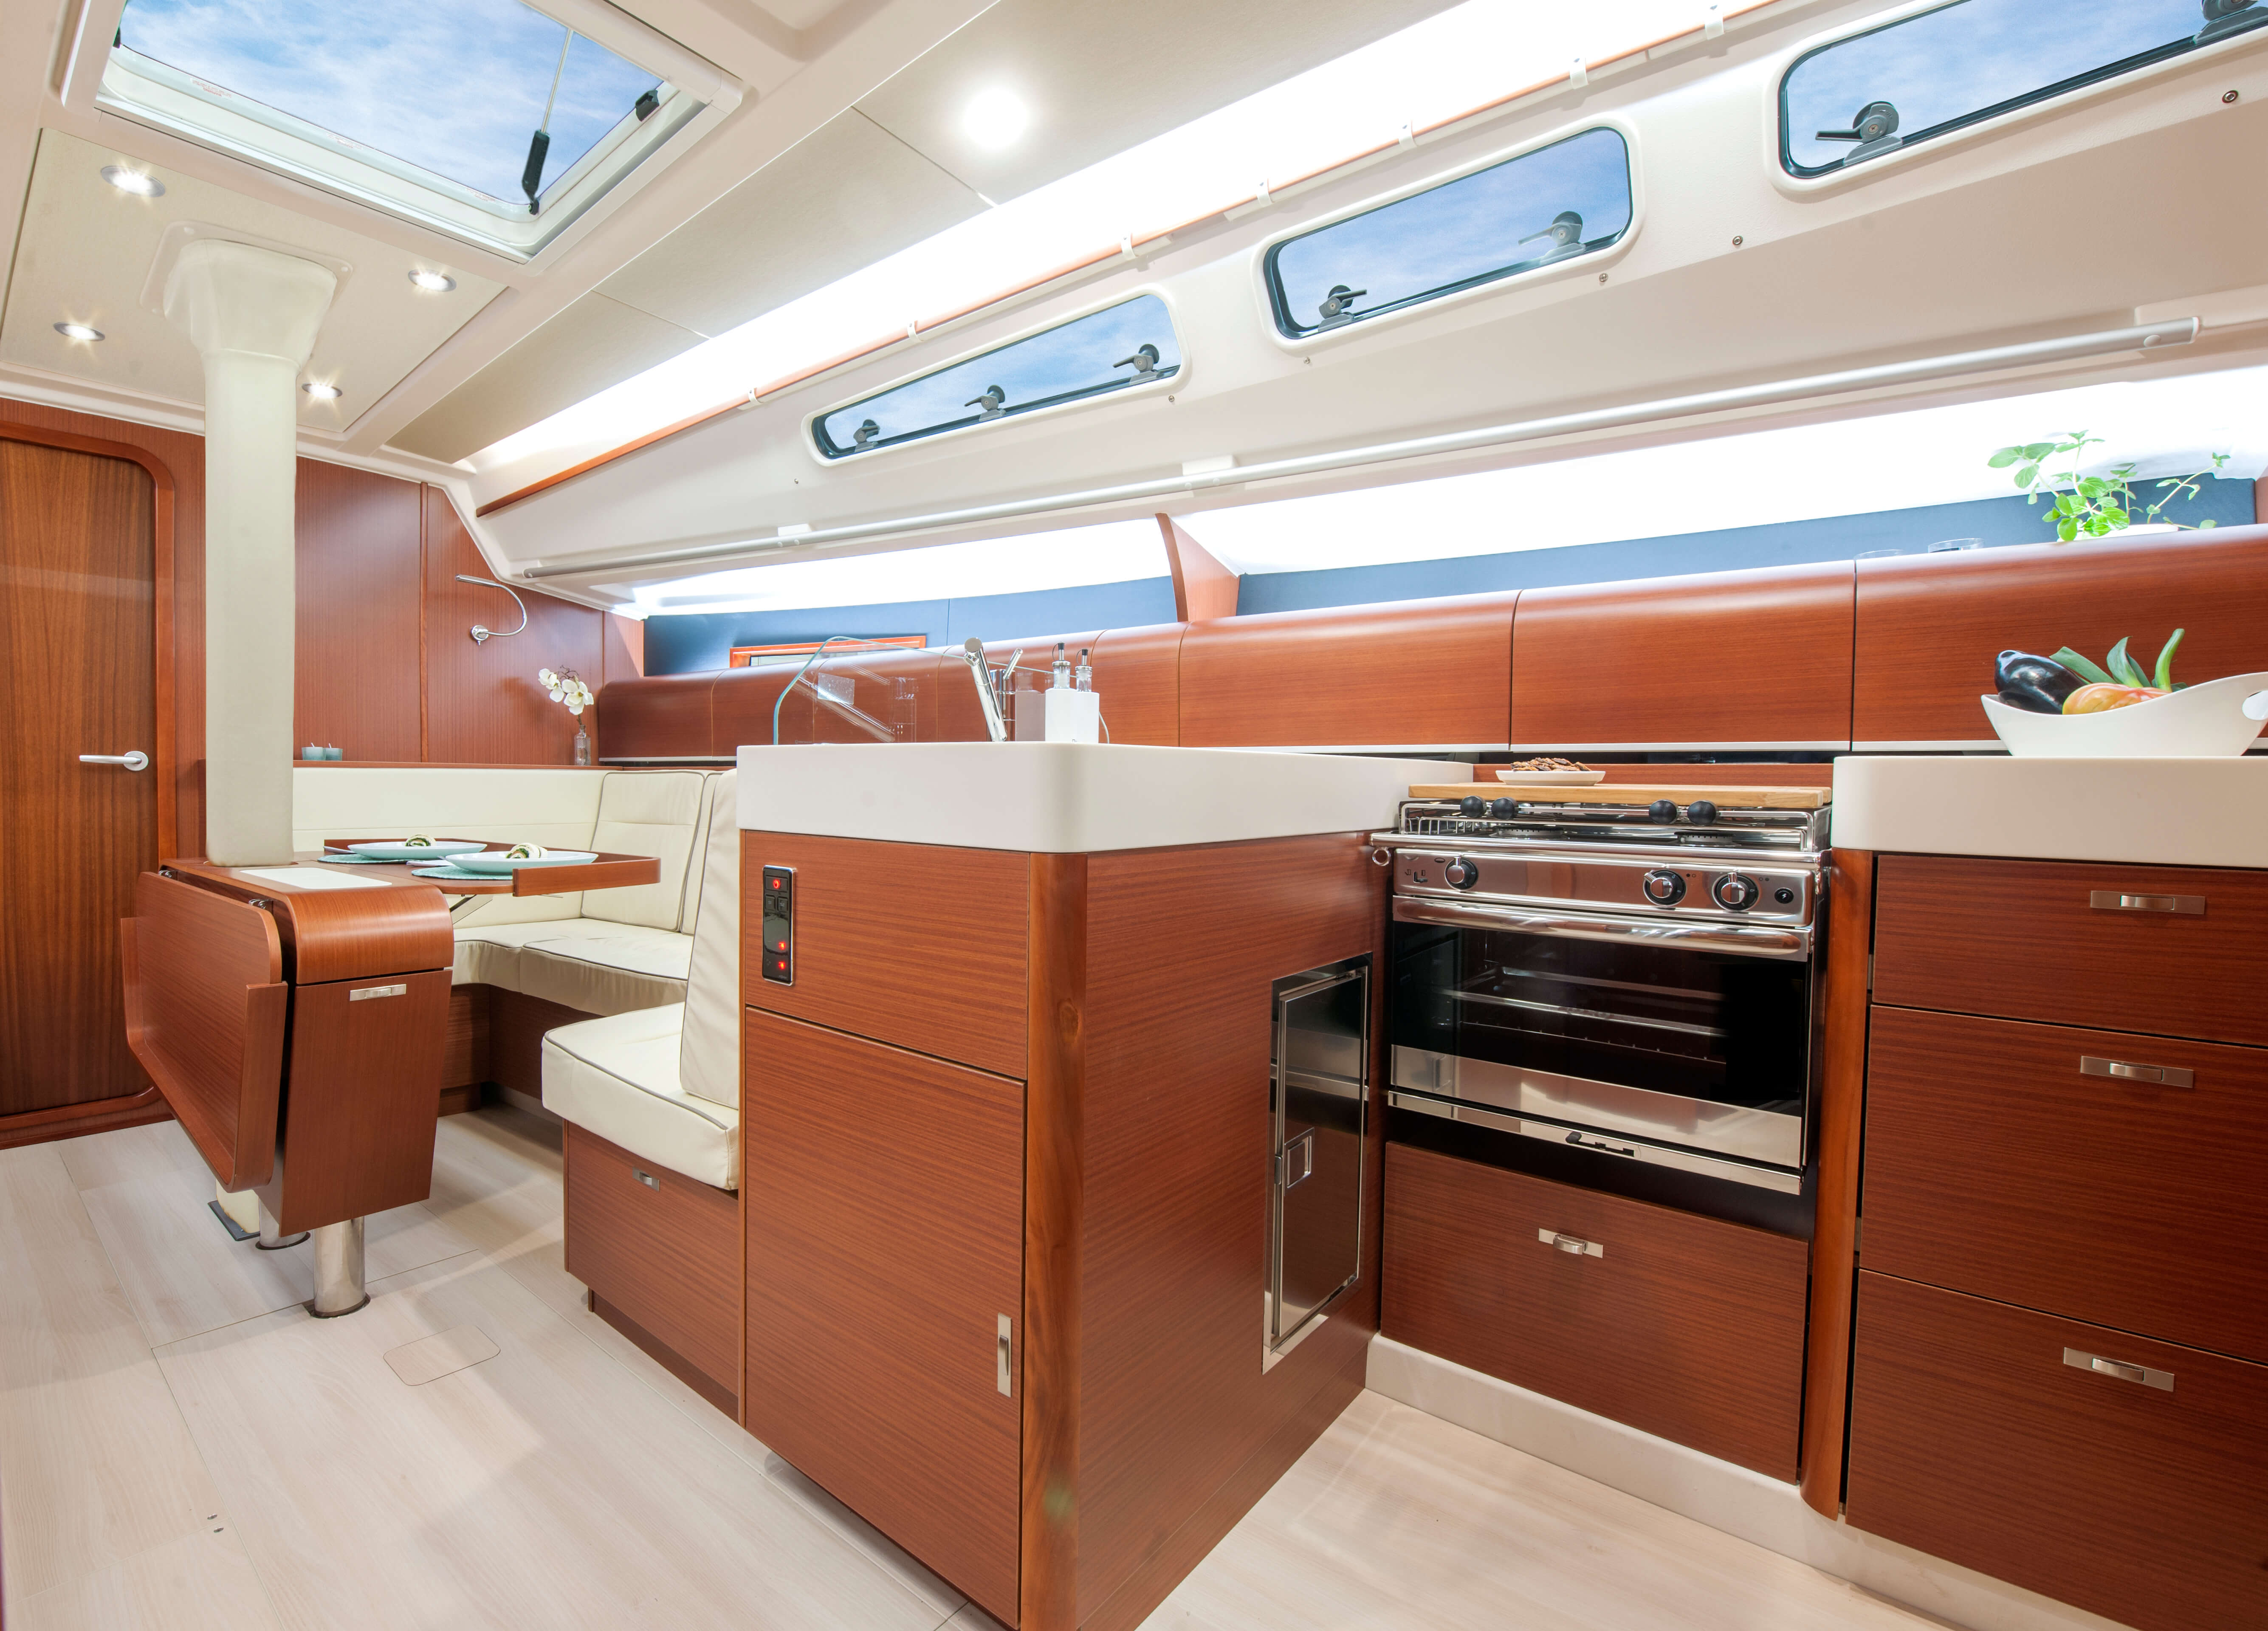 Dehler 42 Interior view lounge | sitting area, foldable table, stove, fridge, sink | Dehler